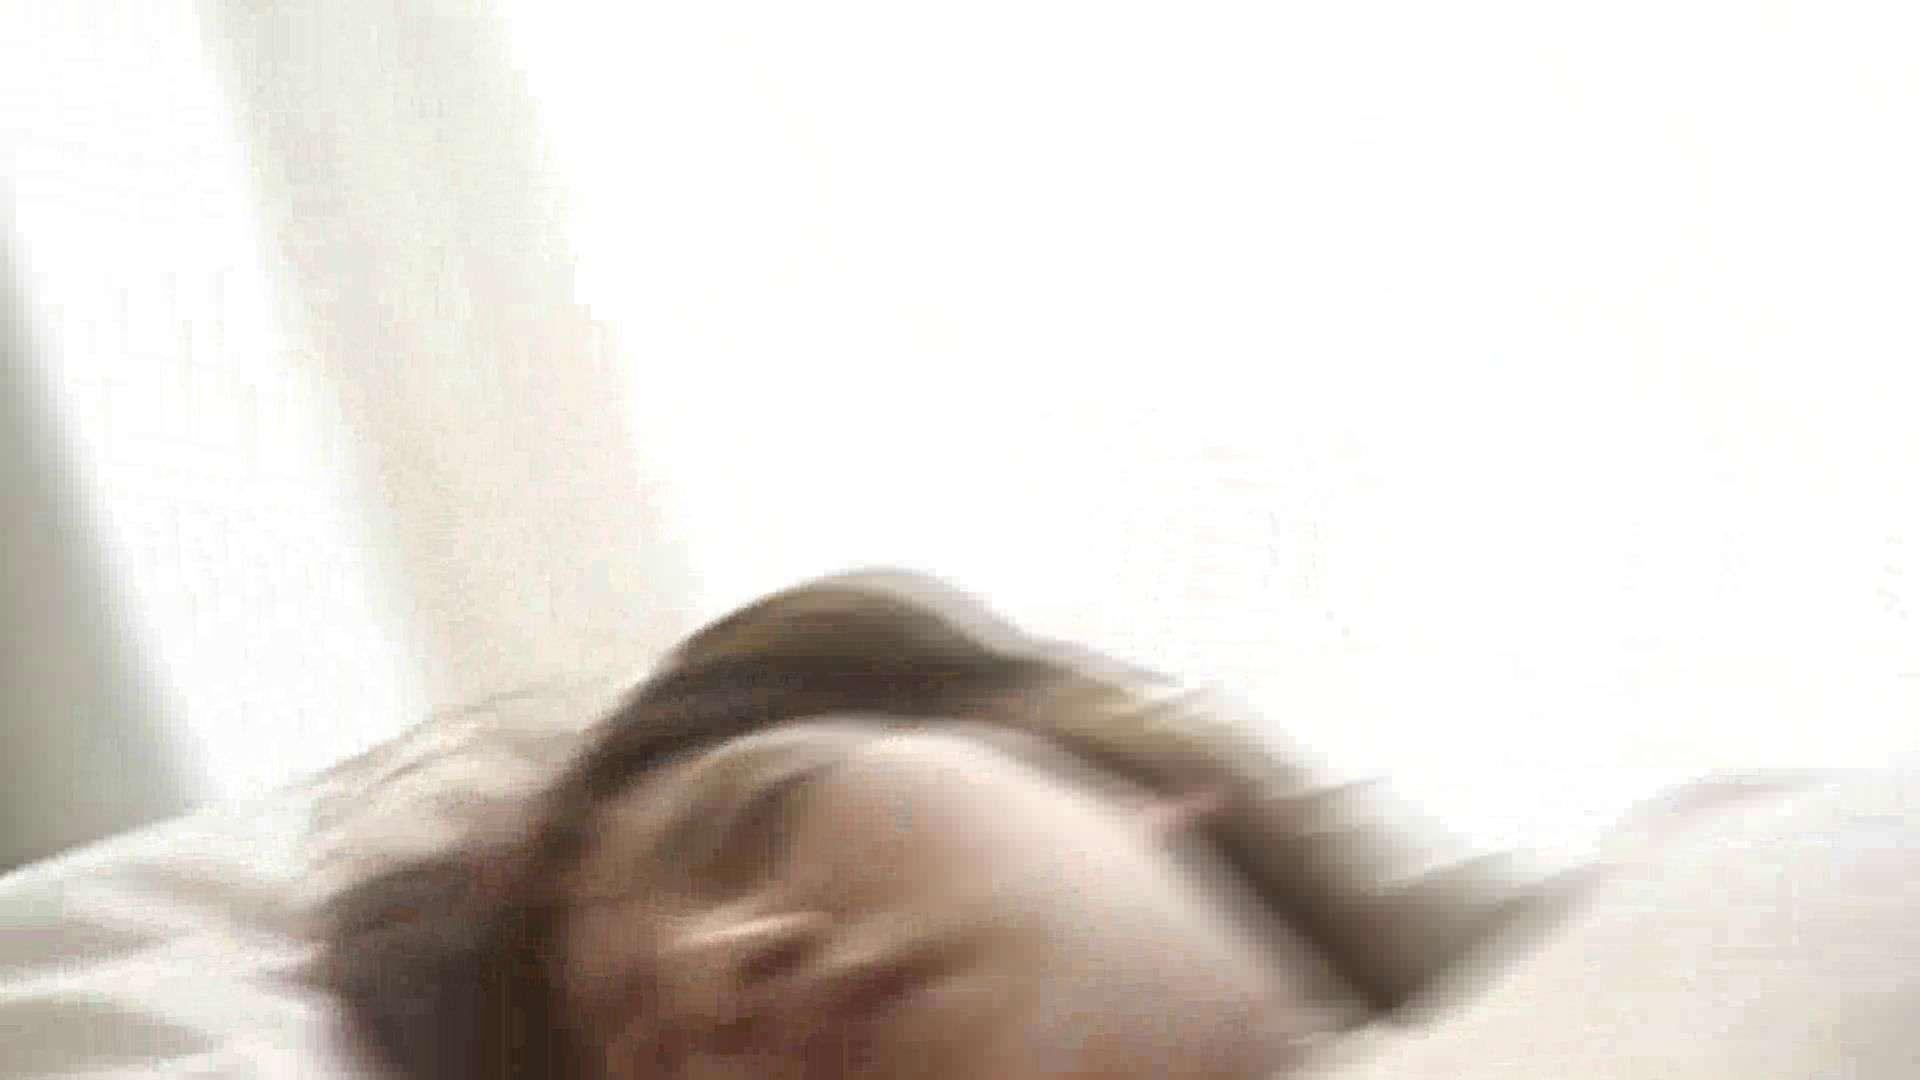 S級厳選美女ビッチガールVol.16 美女丸裸 AV動画キャプチャ 96pic 70